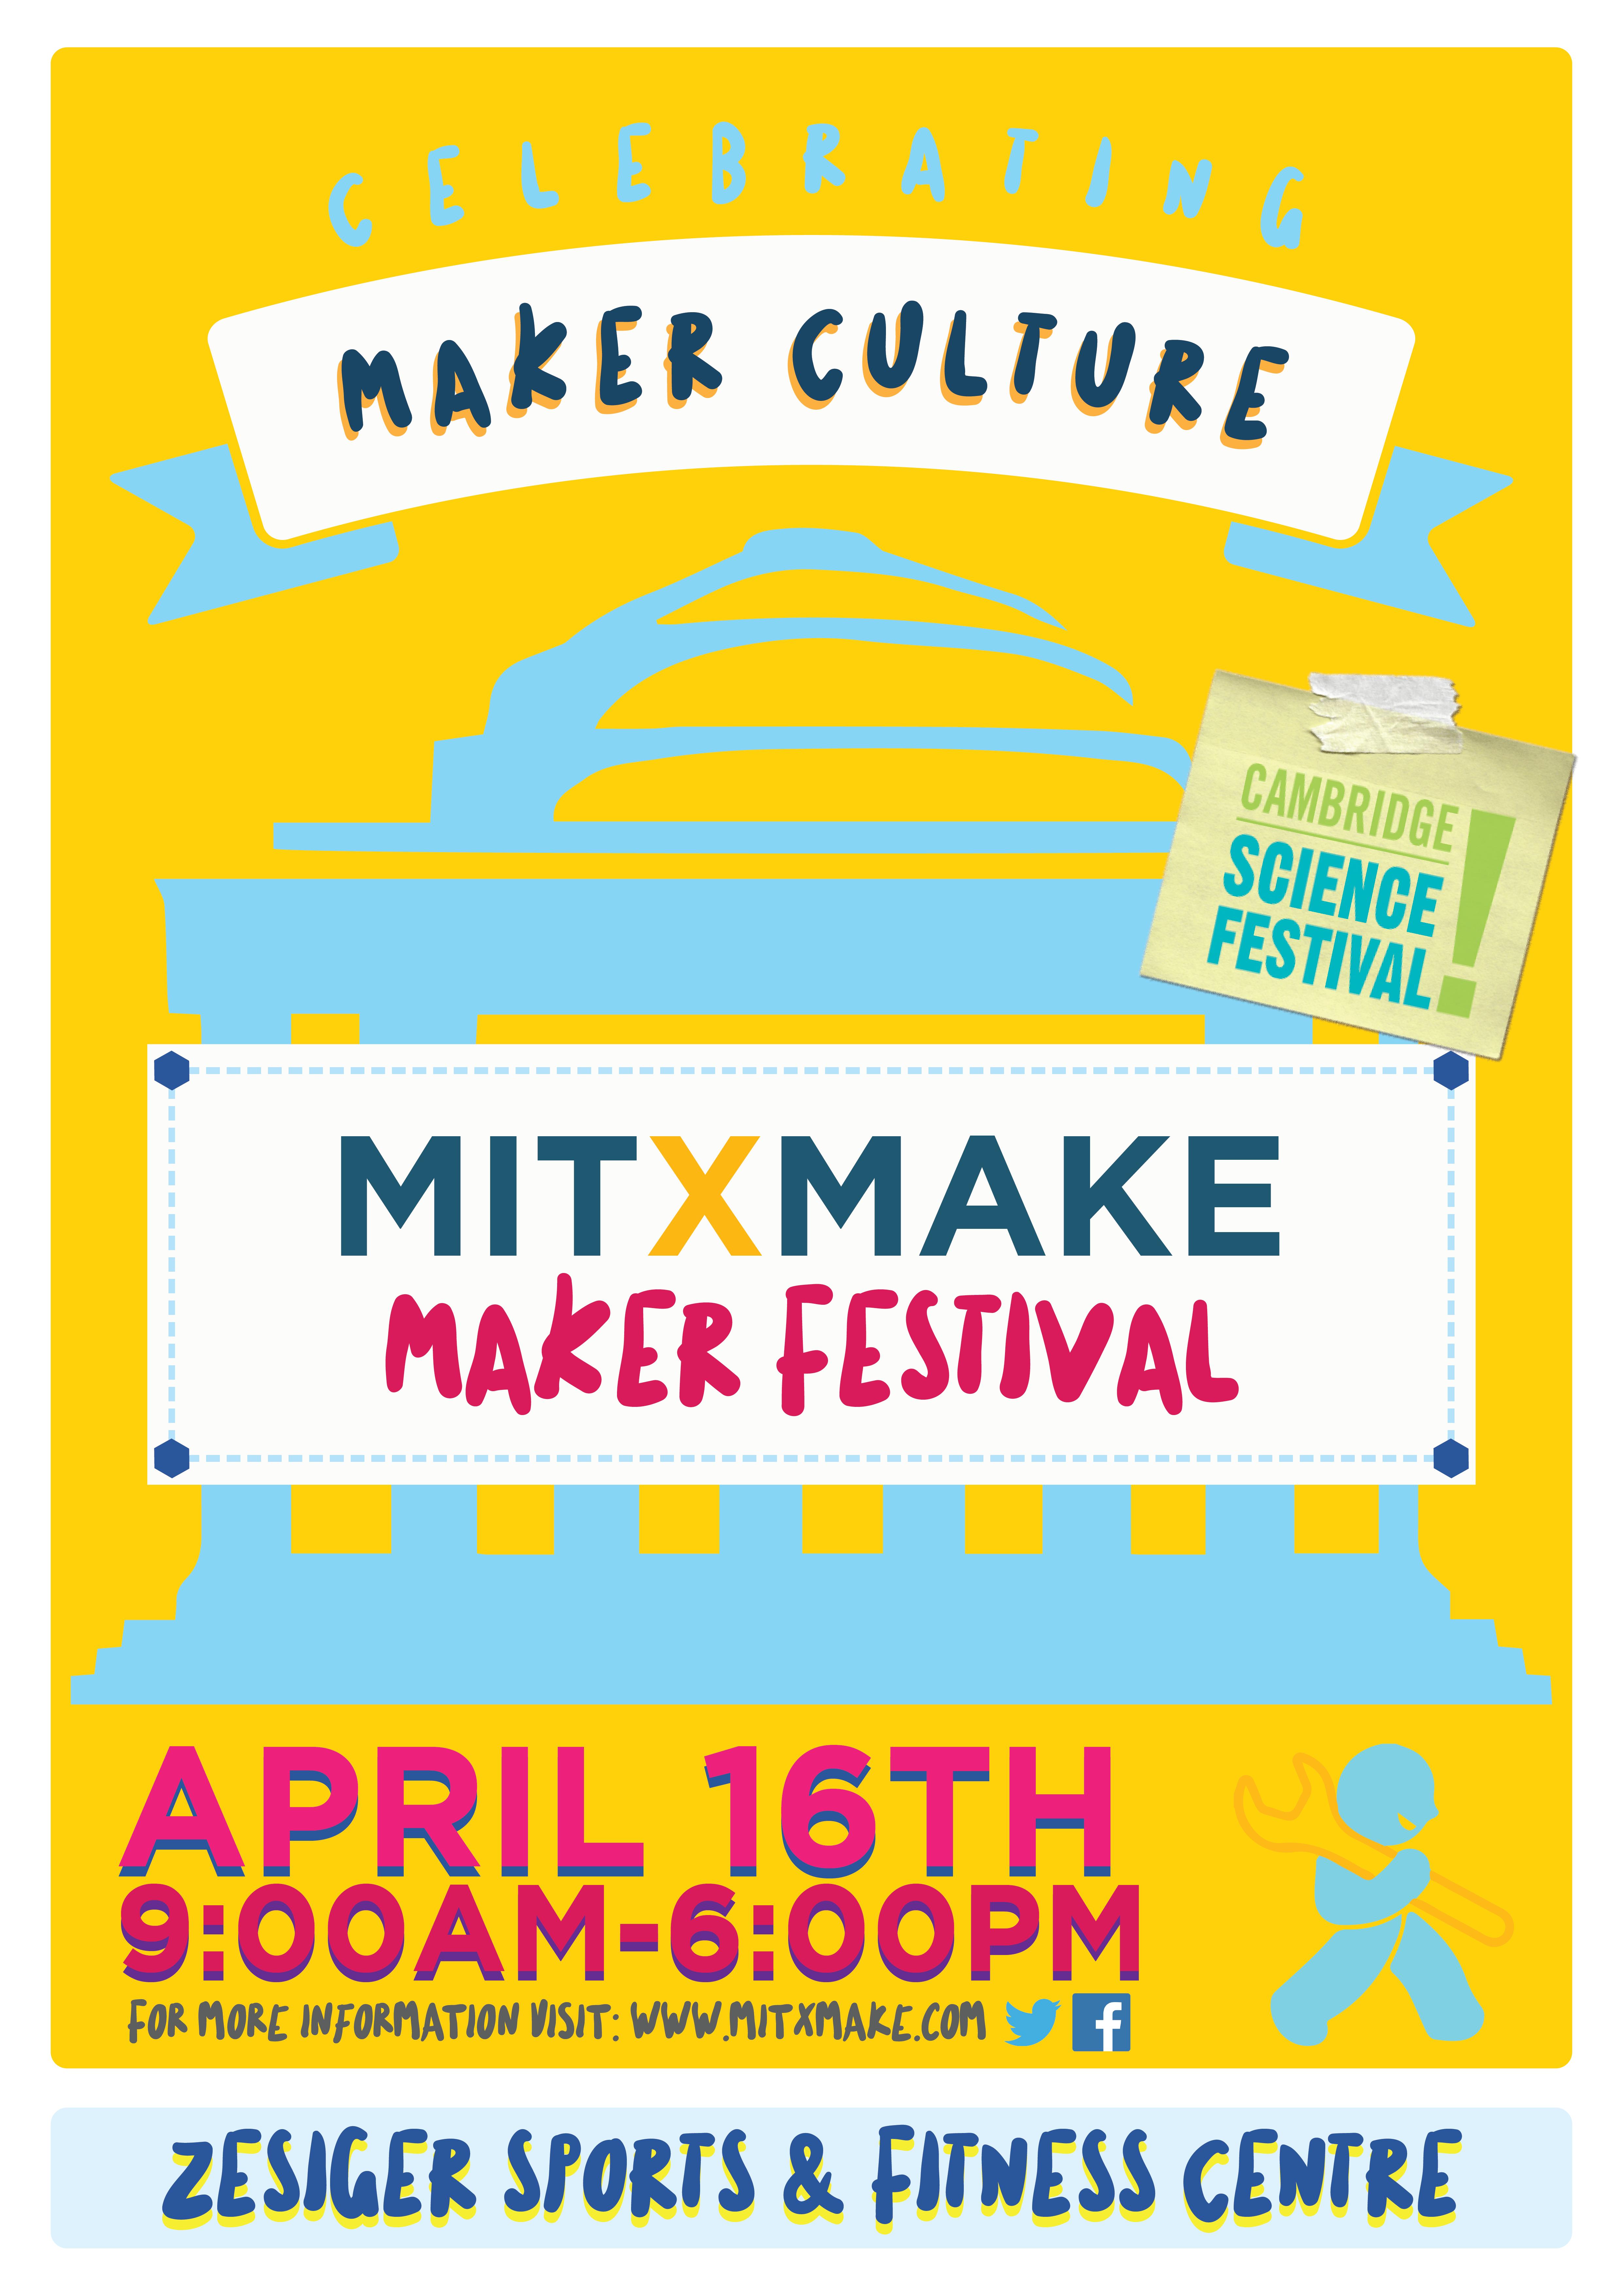 Calendar Poster Maker : Mitxmake maker festival